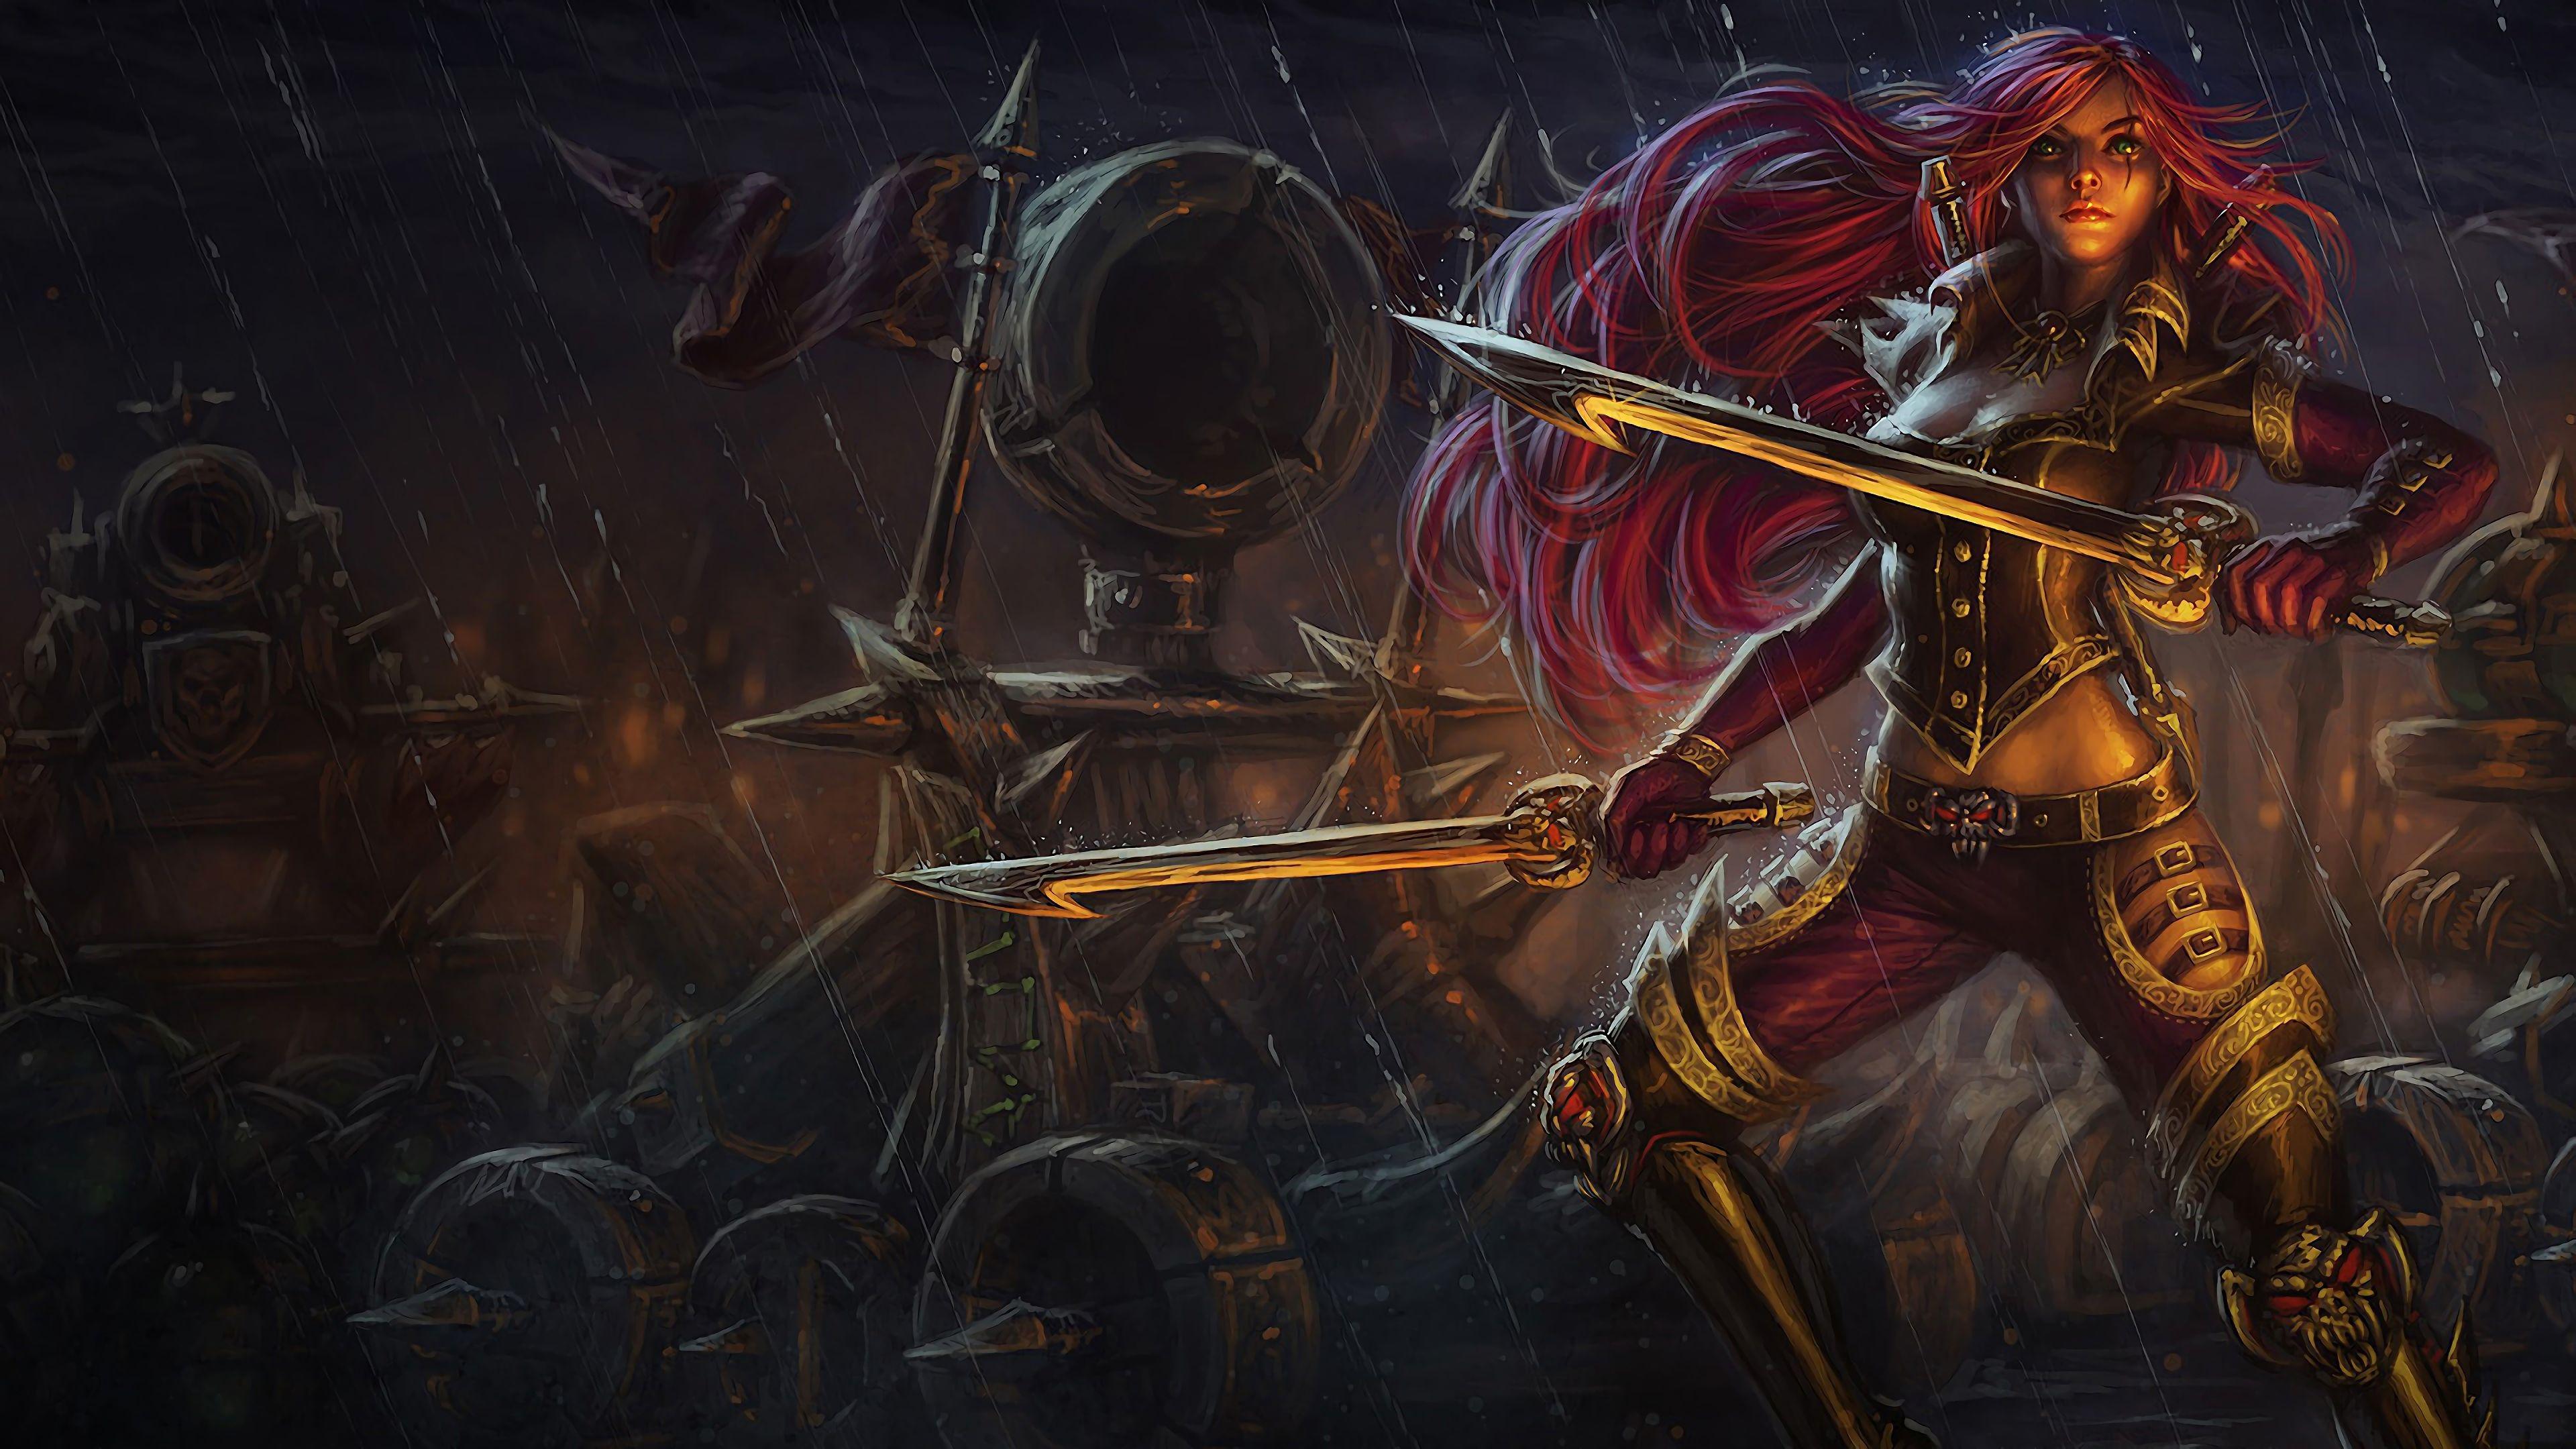 High Command Katarina Lol Splash Art League Of Legends League Of Legends Katarina League Of Legends Legend Images Legend